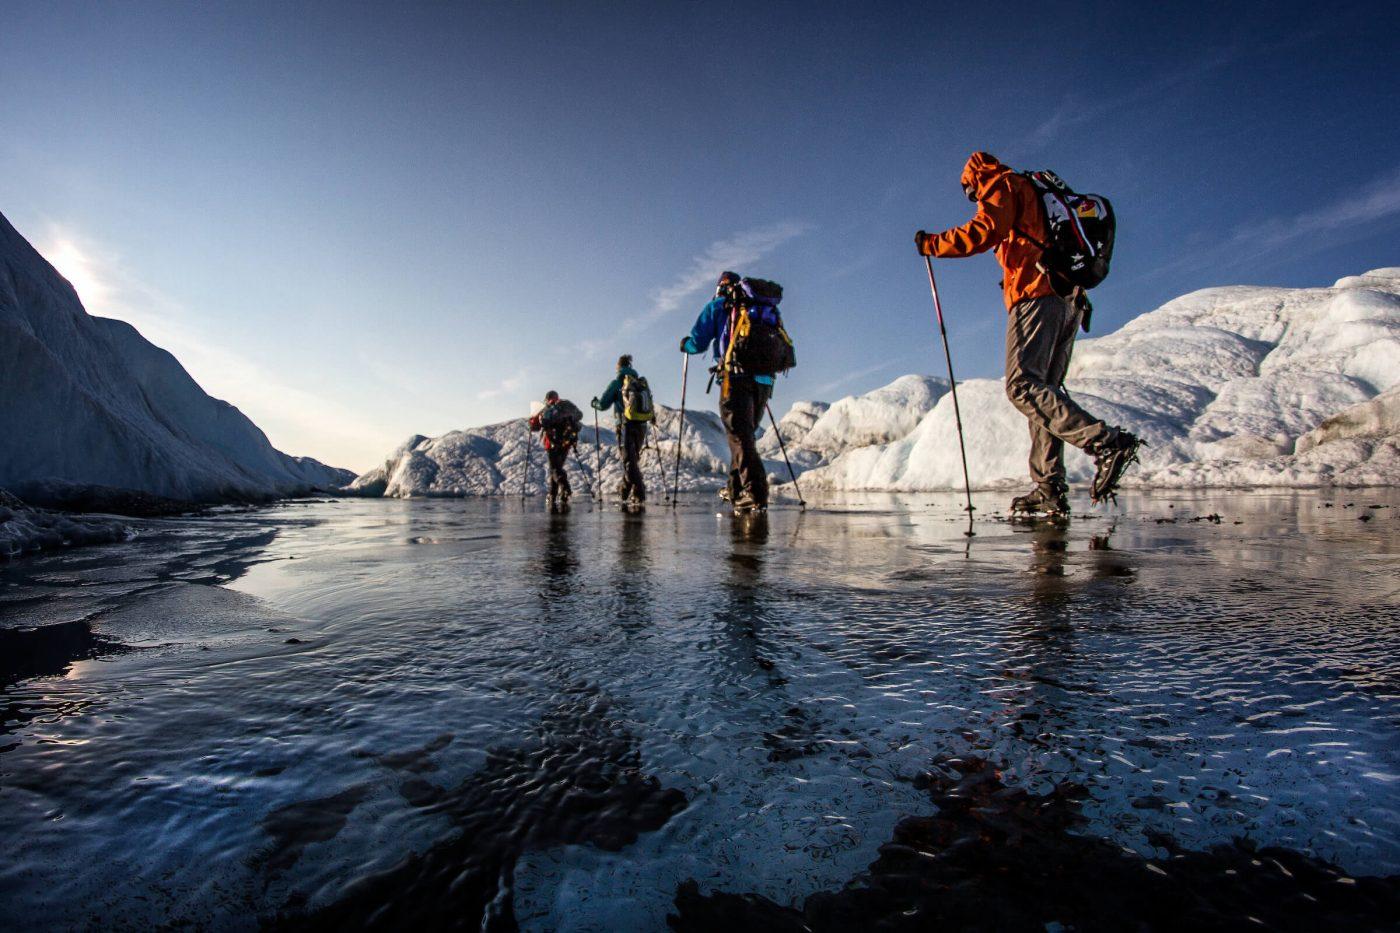 Glacier walking on the Greenland Ice Sheet near Kangerlussuaq, by Mads Pihl - Visit Greenland